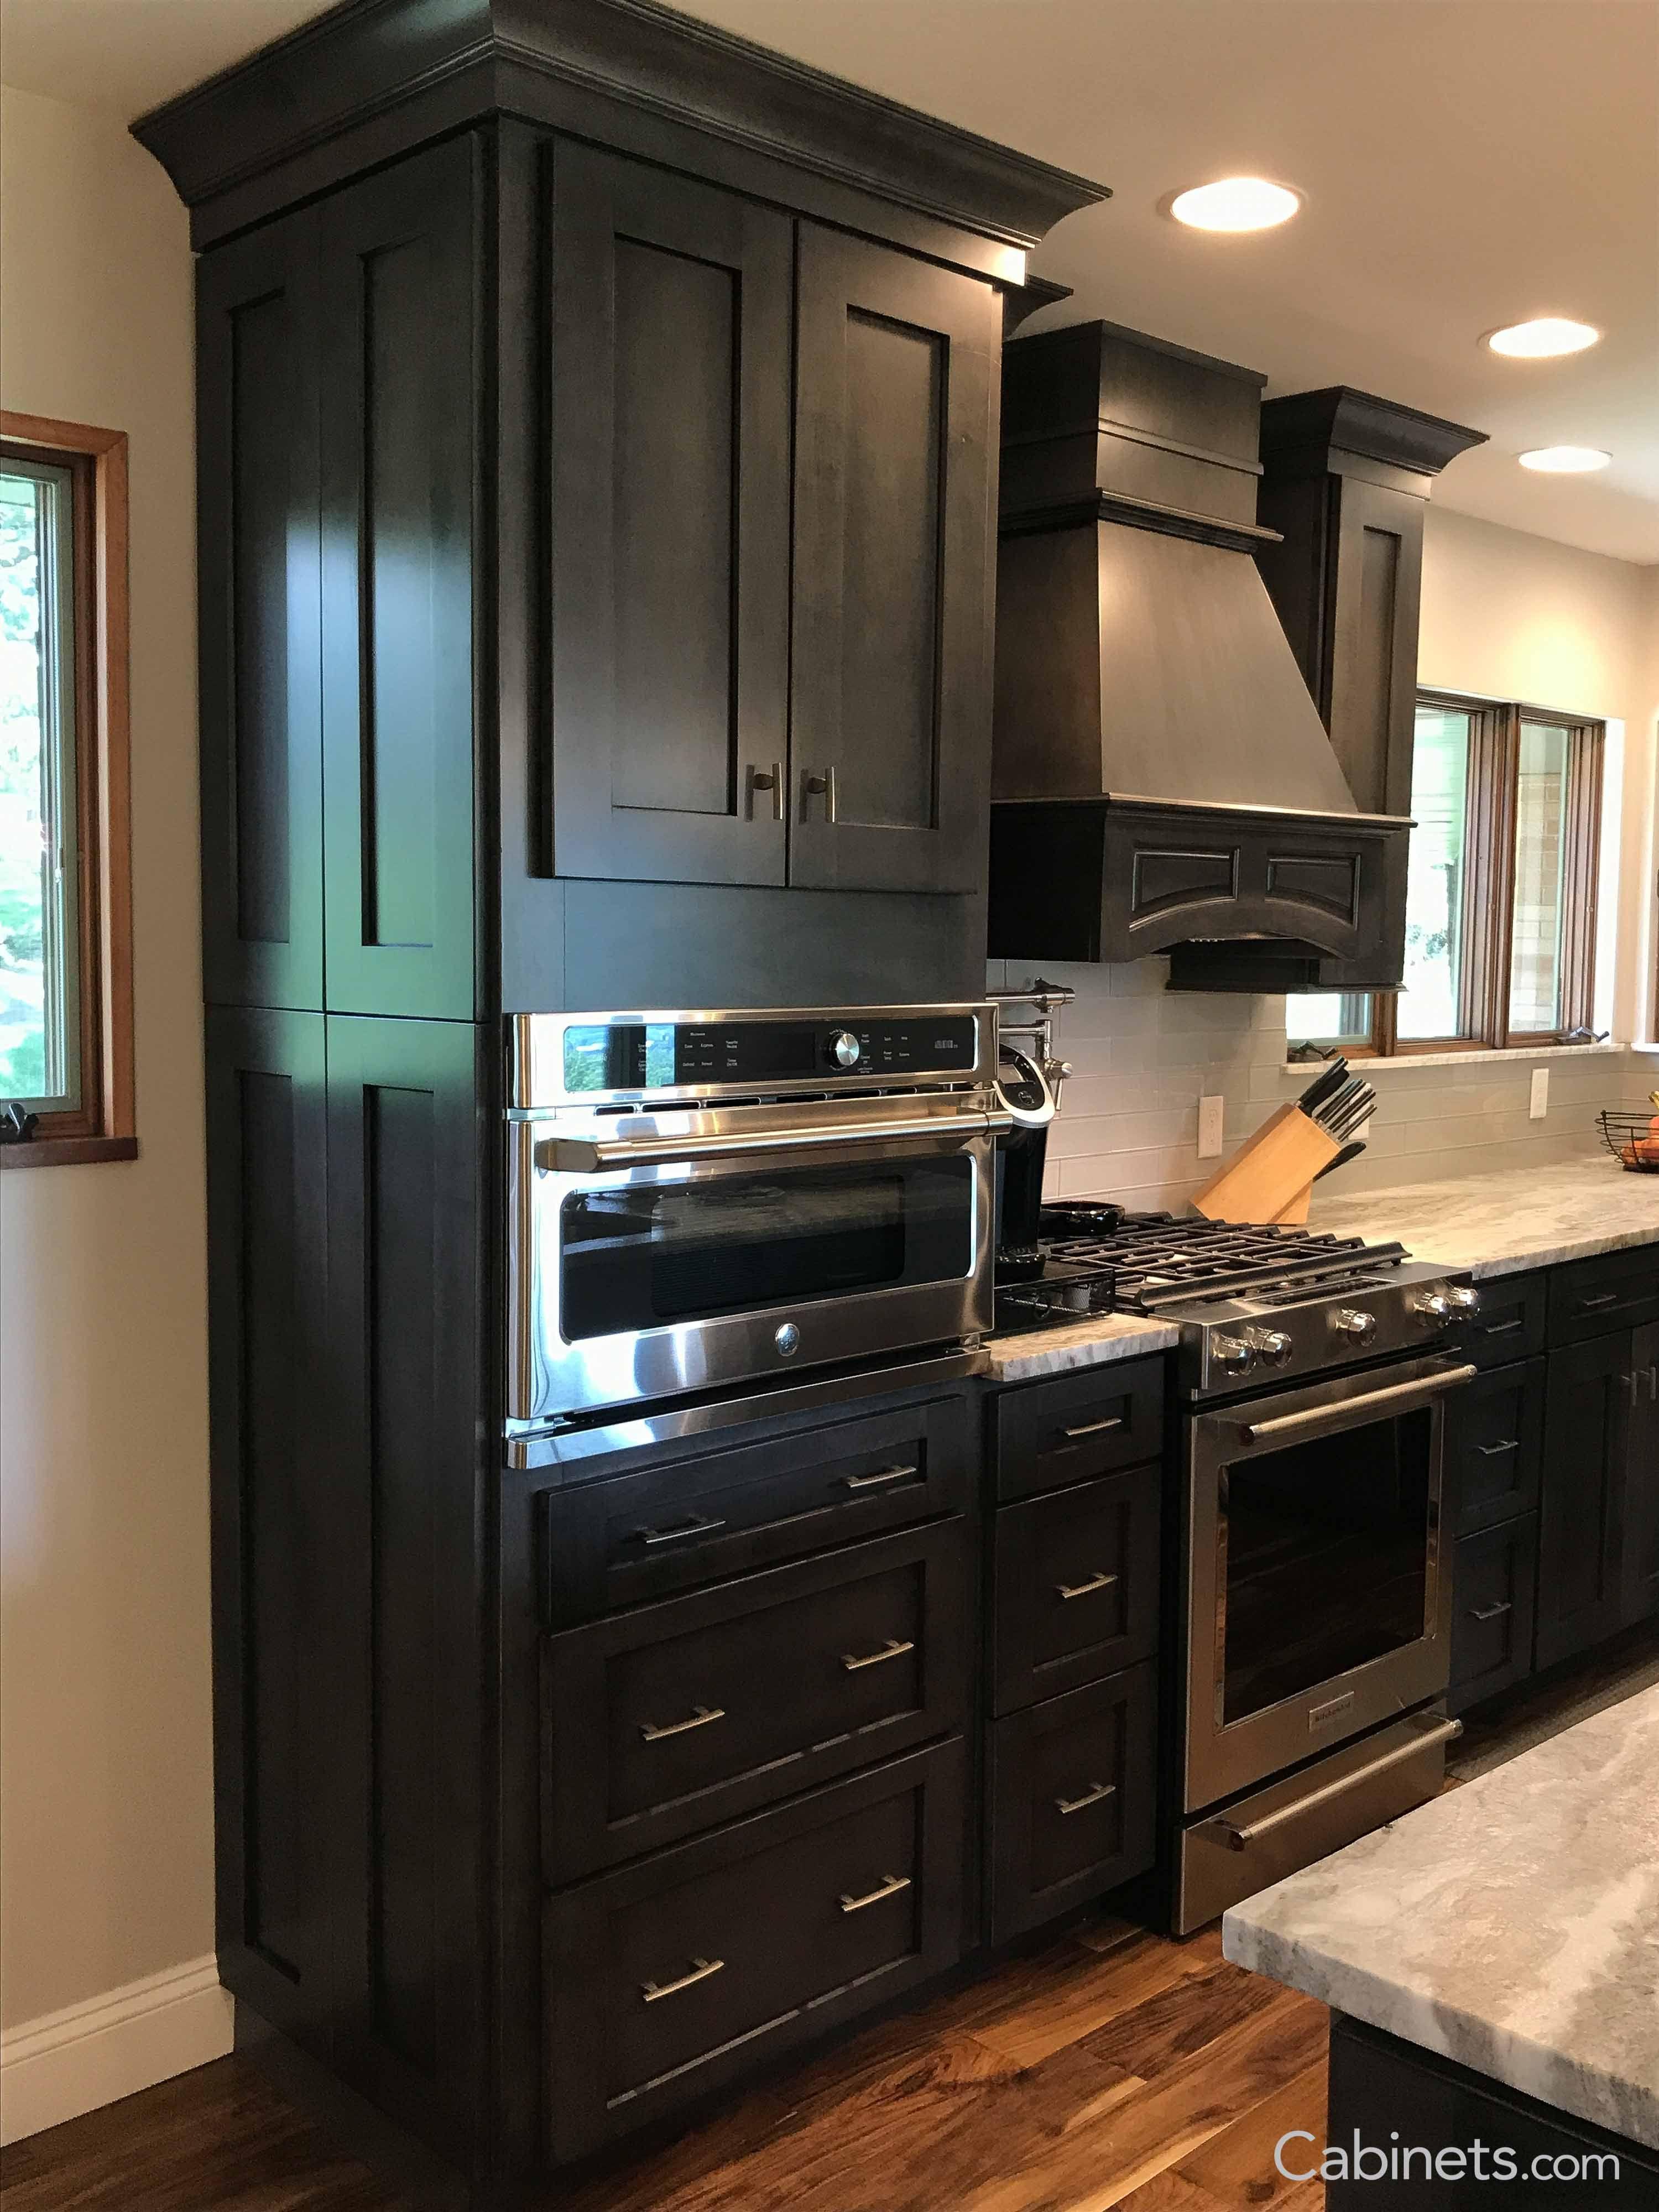 shaker kitchen cabinets travertine tile for backsplash in beautiful style